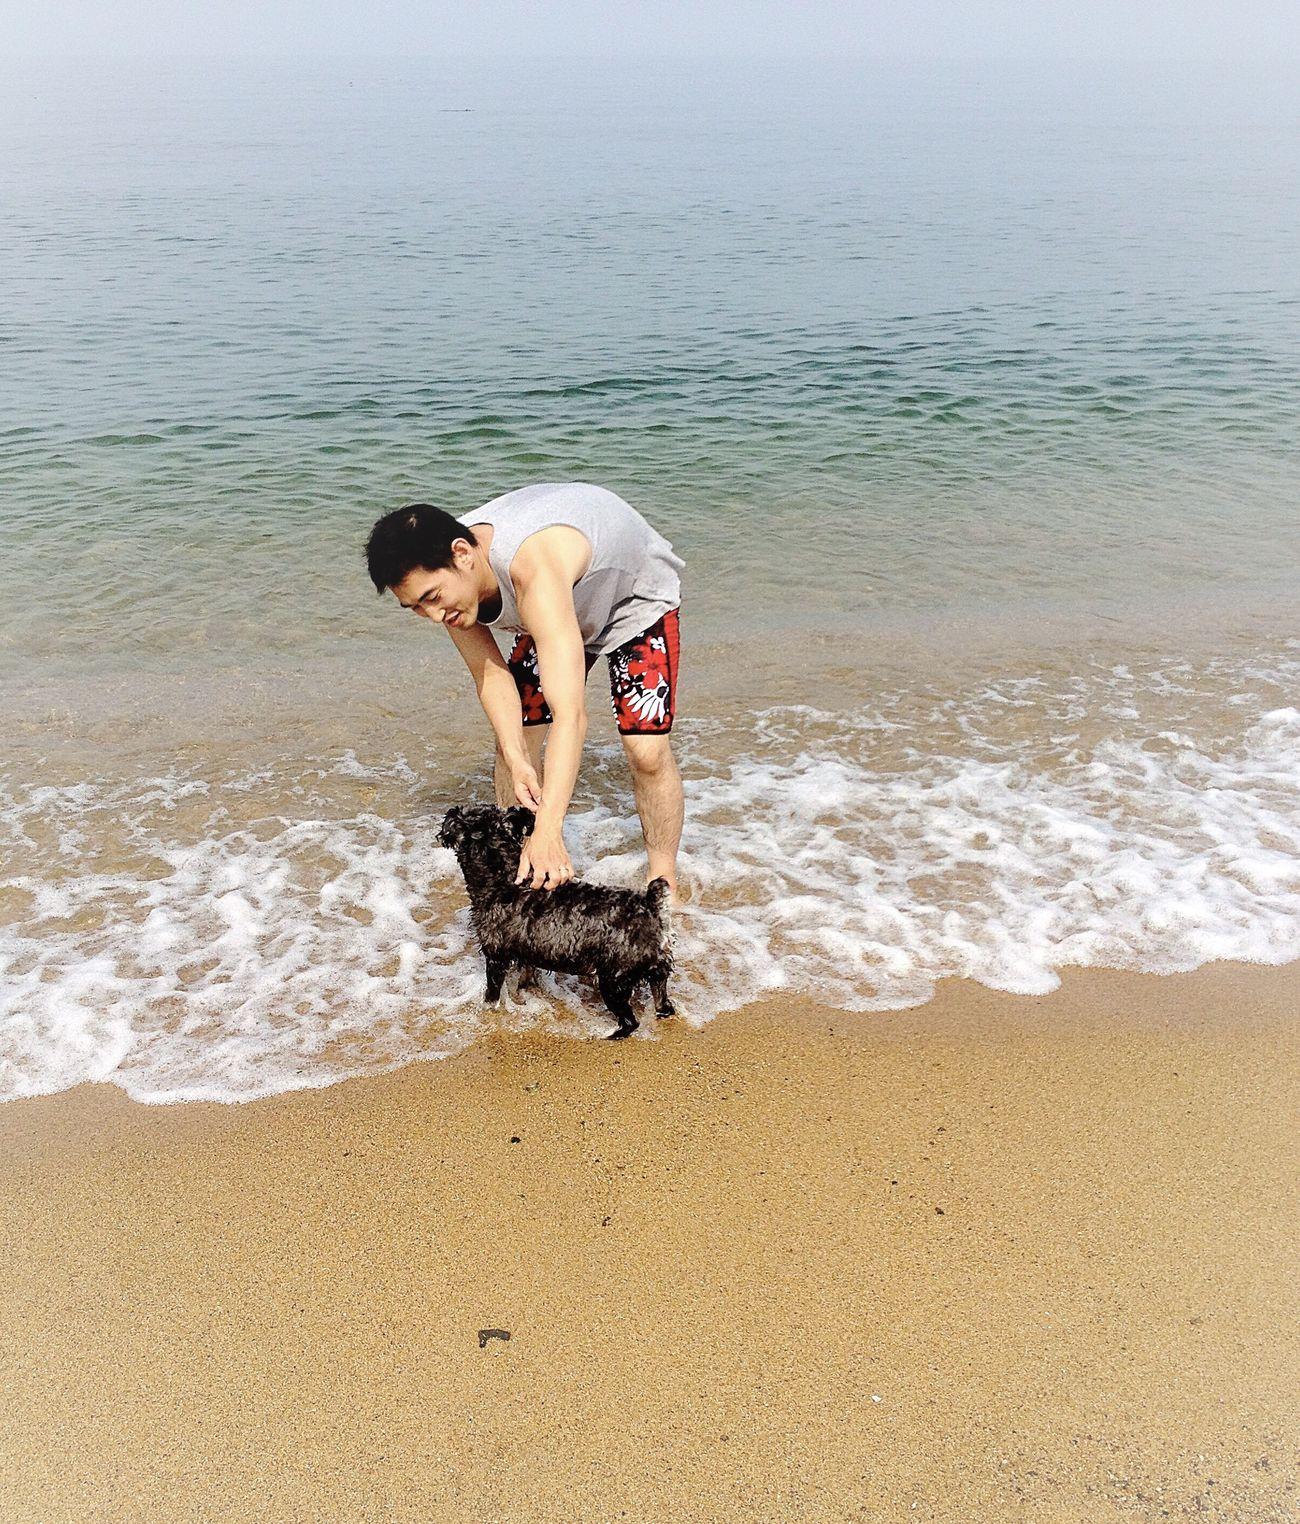 Awaji Island Awajishima Hyogo Dog Ocean Family People Together